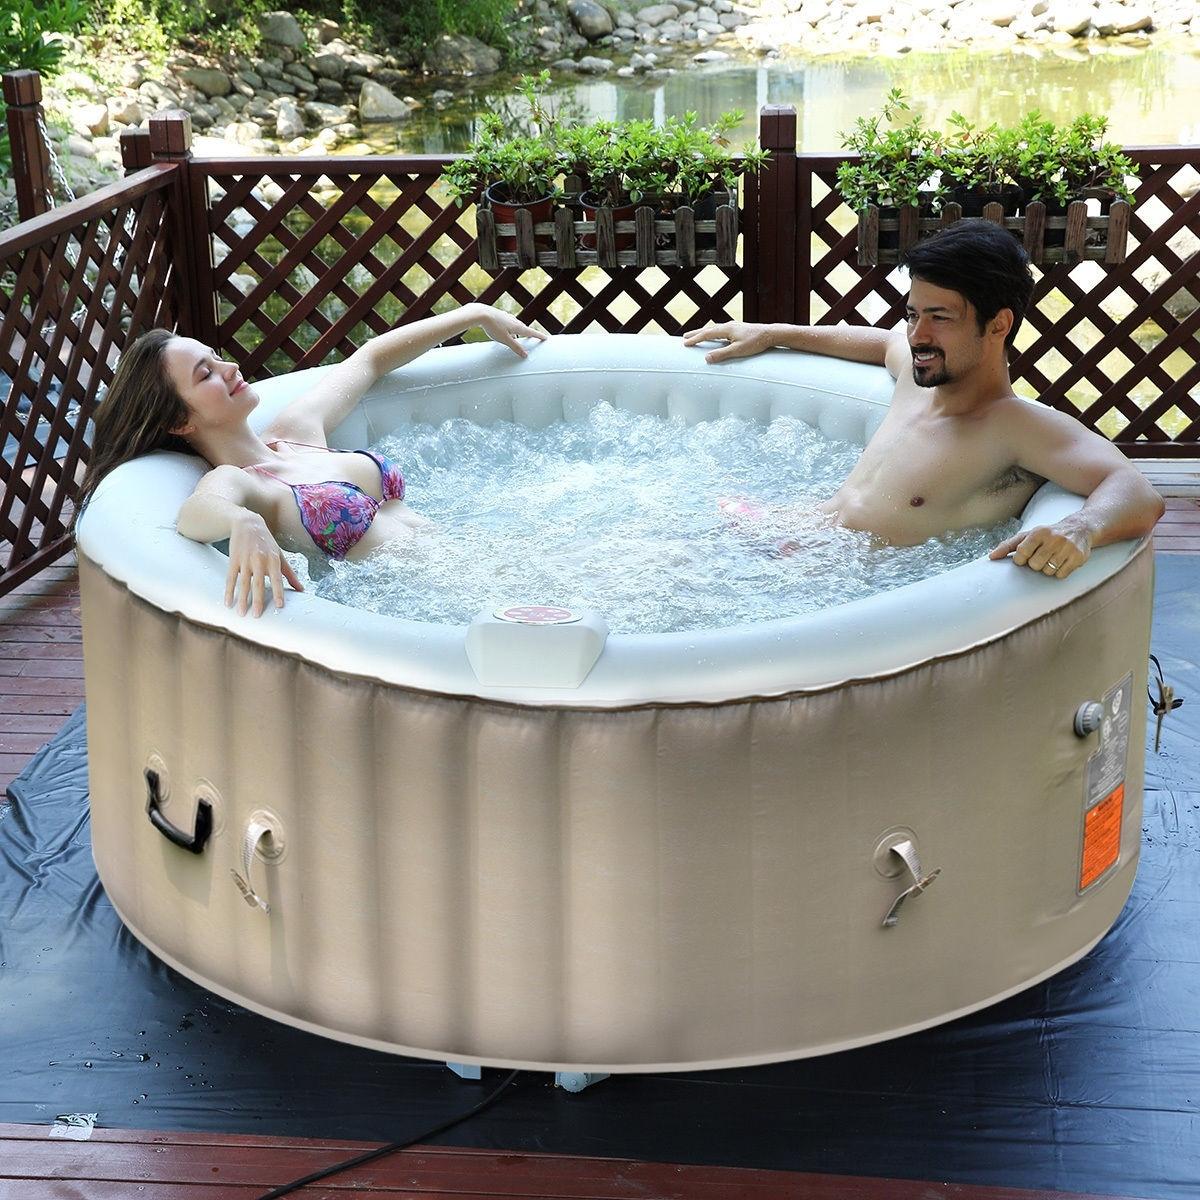 Shop Goplus Portable Inflatable Bubble Massage Spa Hot Tub 4 Person ...